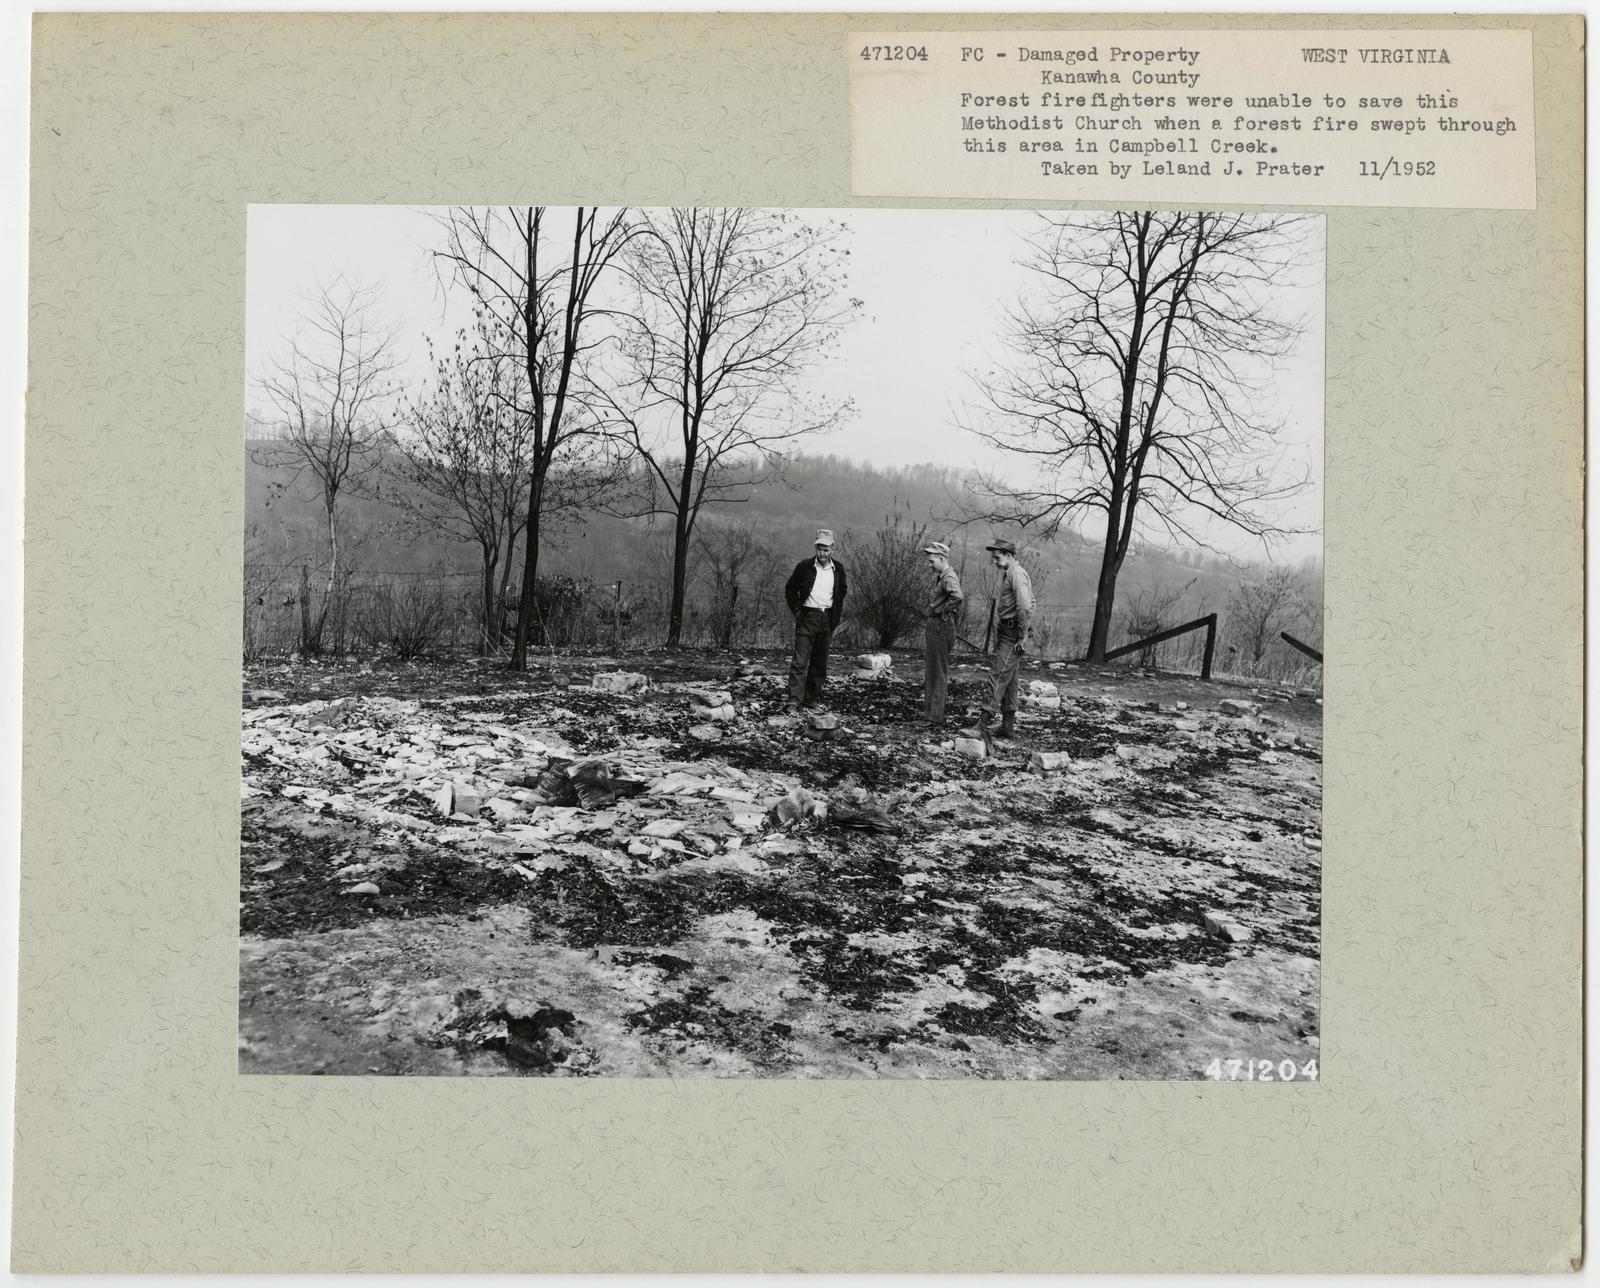 Damaged Properties - West Virginia